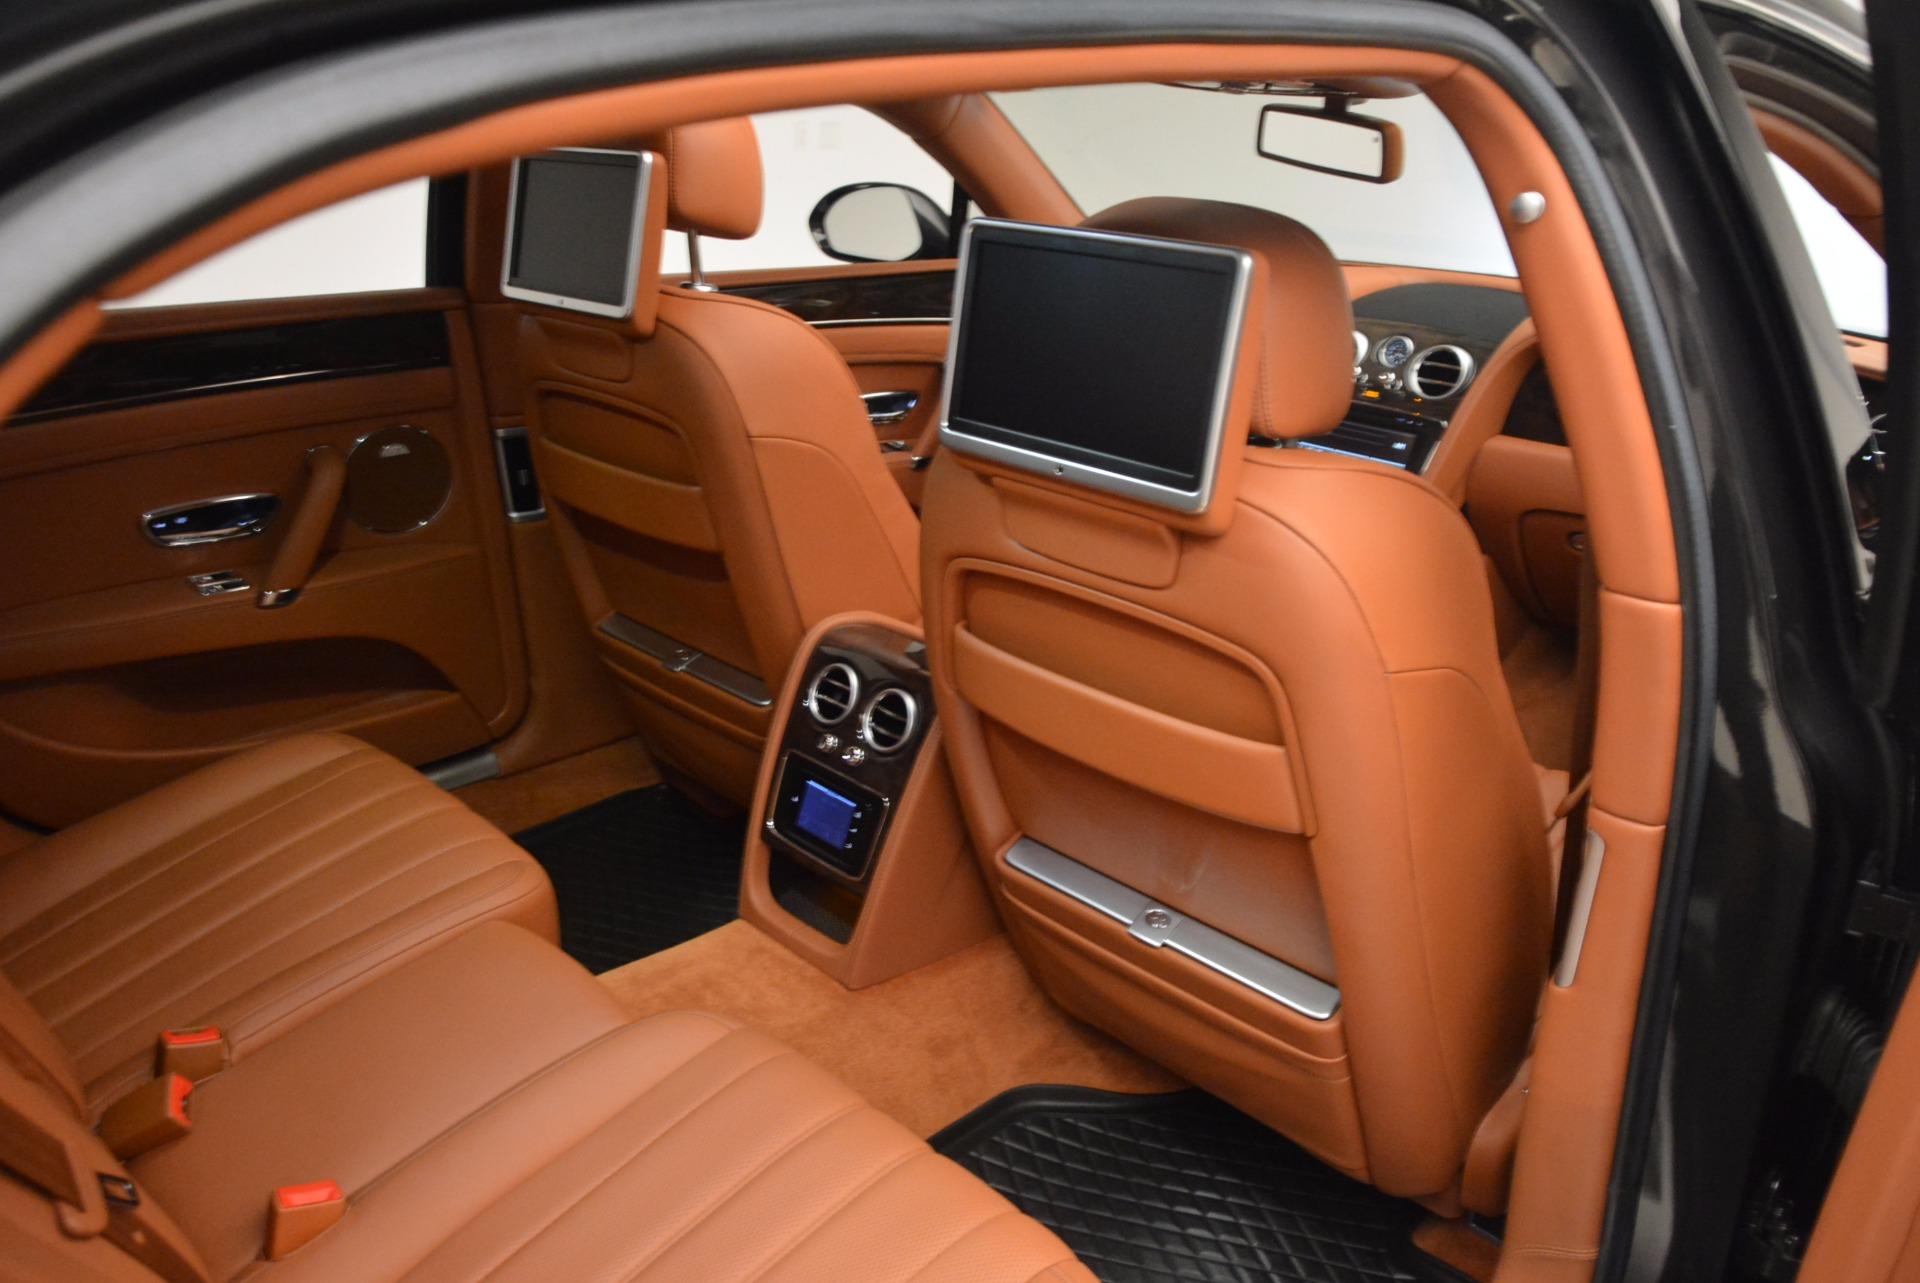 Used 2014 Bentley Flying Spur W12 For Sale In Westport, CT 1598_p36